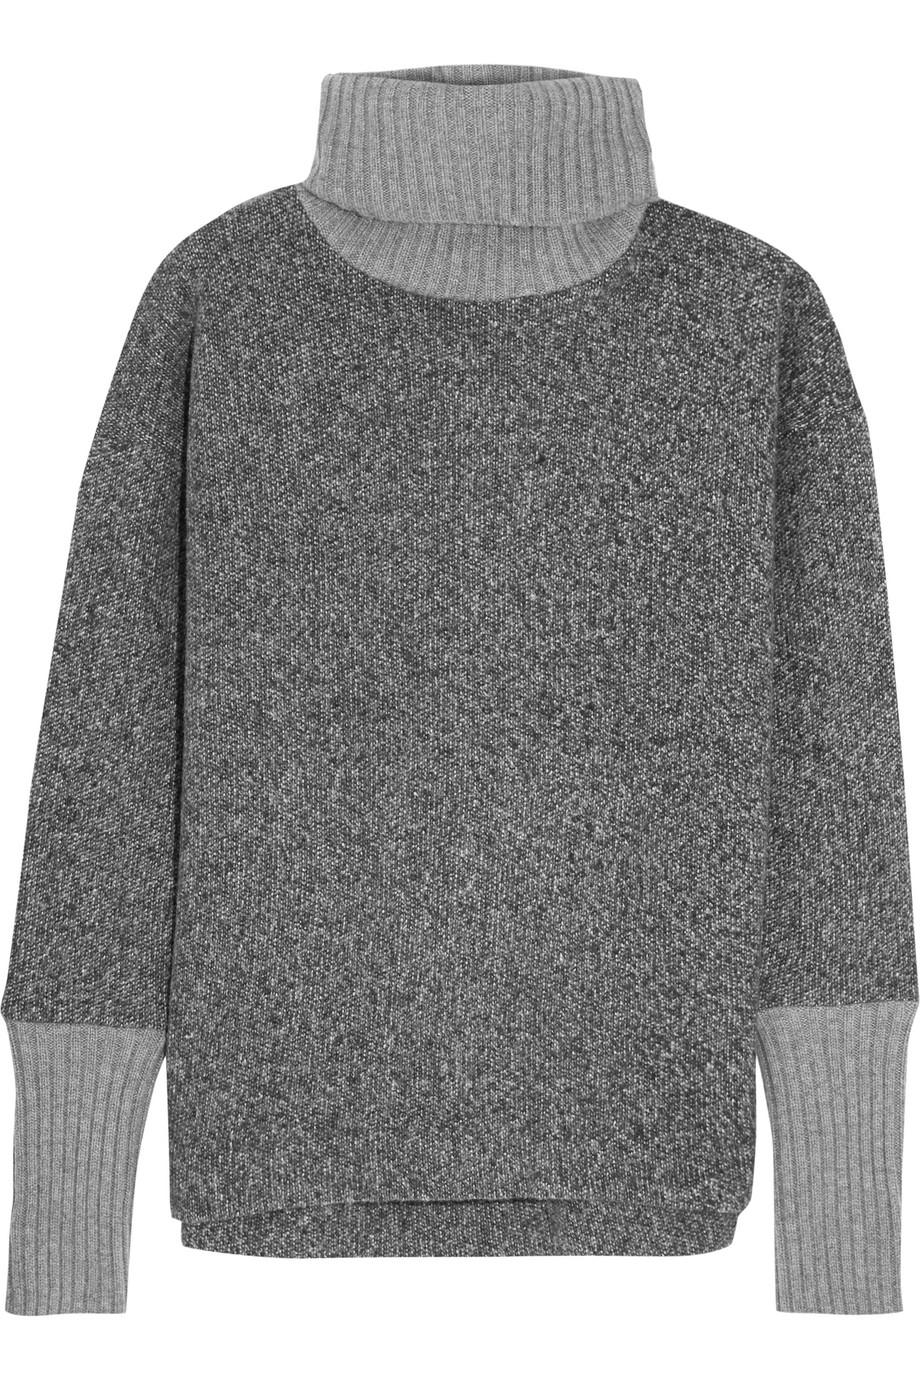 J.Crew Cashmere-Trimmed Fleece Turtleneck Sweater, Gray, Women's, Size: L